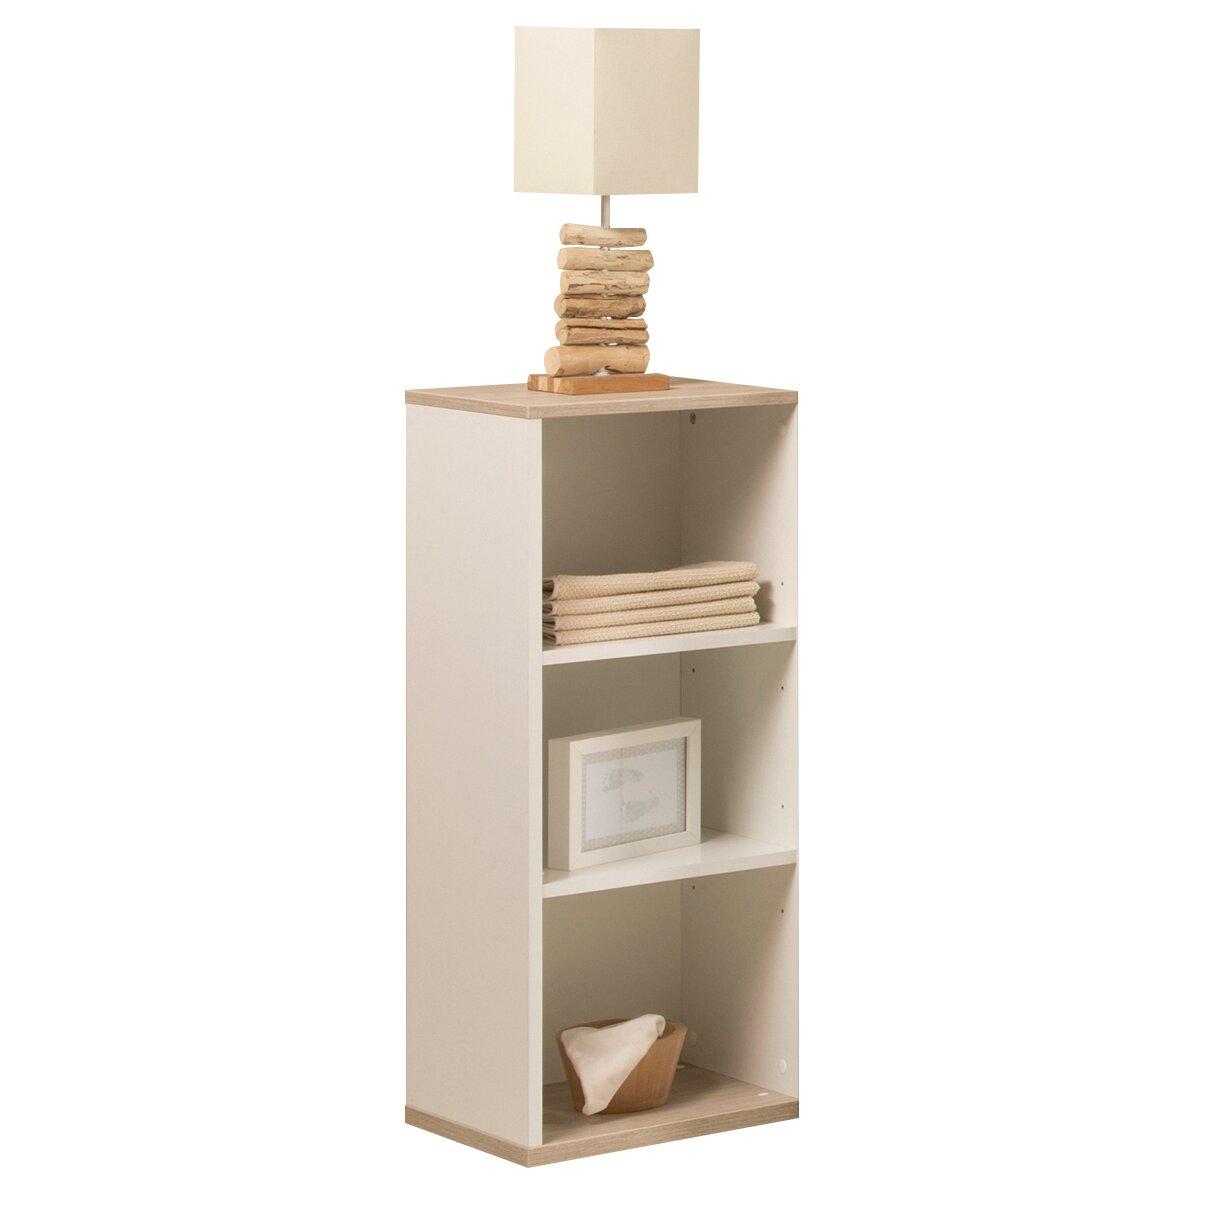 Roba moritz 91cm bookcase wayfair uk - Roba kinderzimmer moritz ...